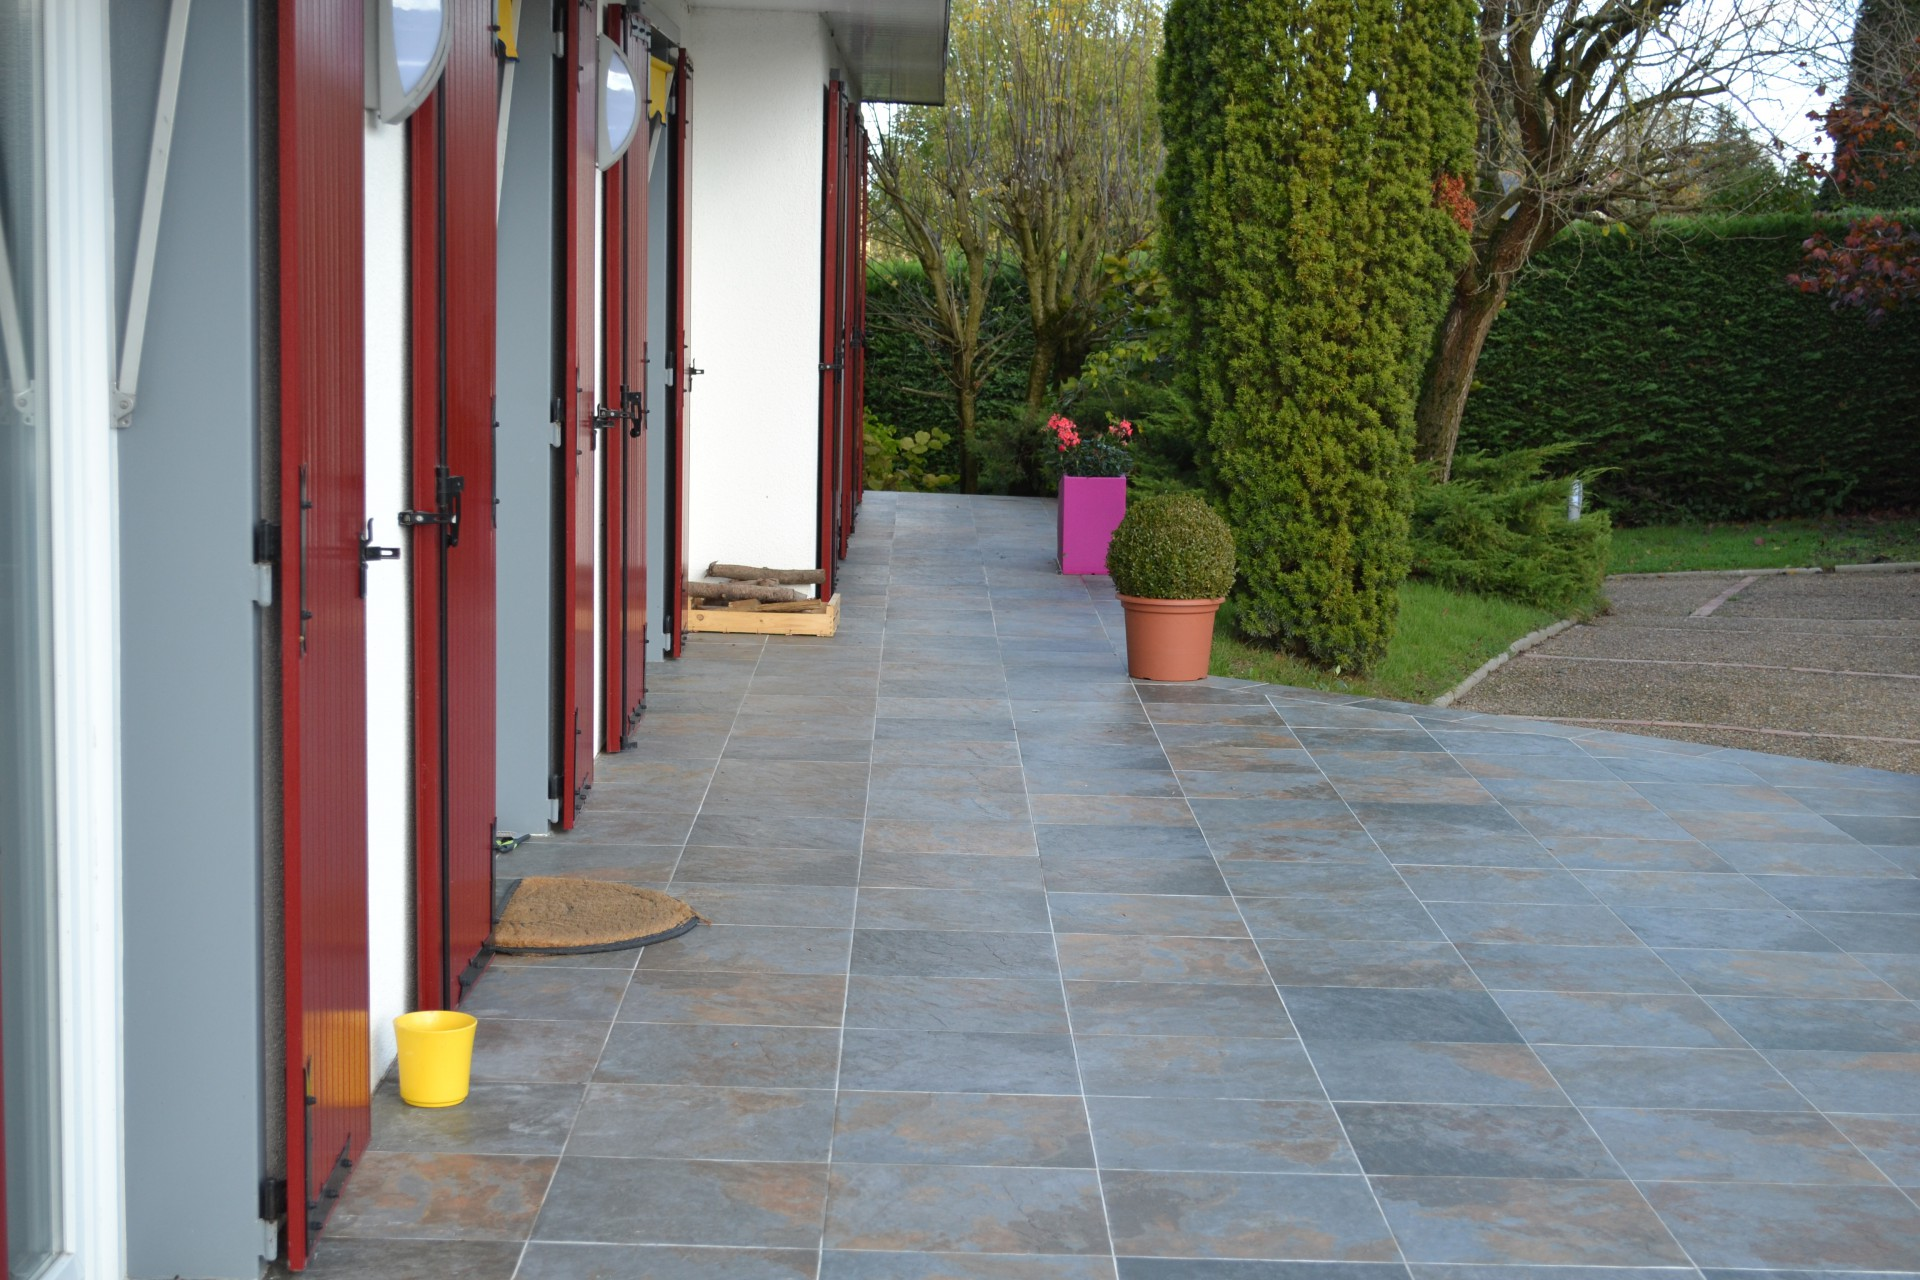 Carrelage design carrelage exterieur terrasse moderne for Carrelage pour terrasse